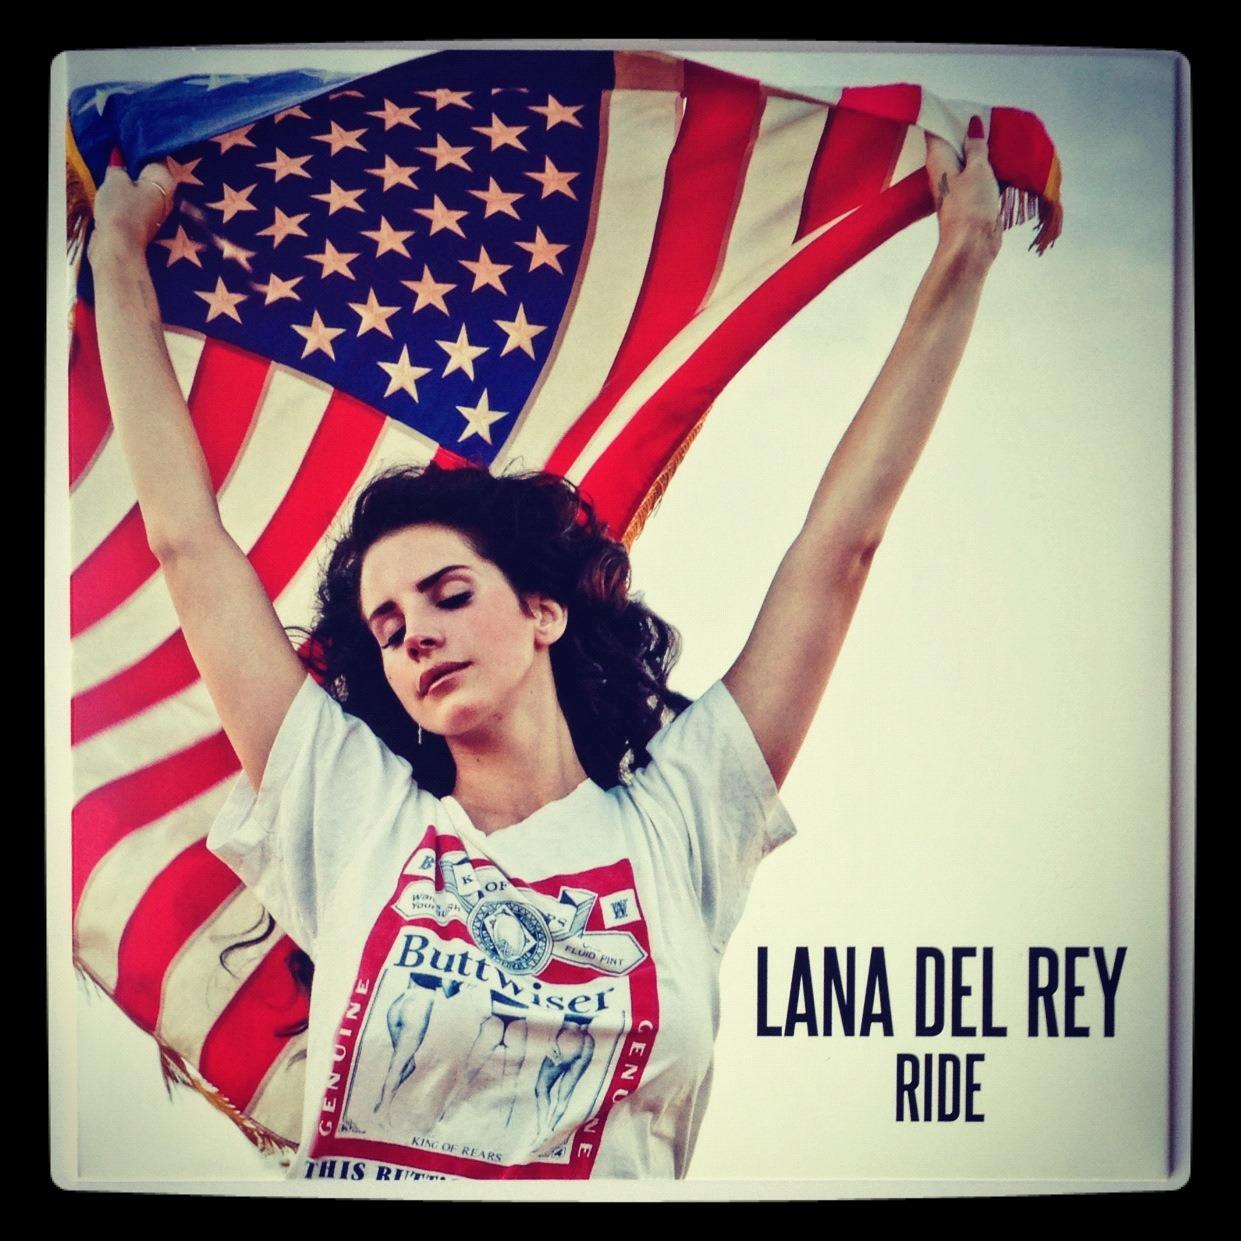 Single >> Ride [#HappyBdayRide!] - Página 12 Tumblr_mdgp5bSJL11r99ziso1_1280